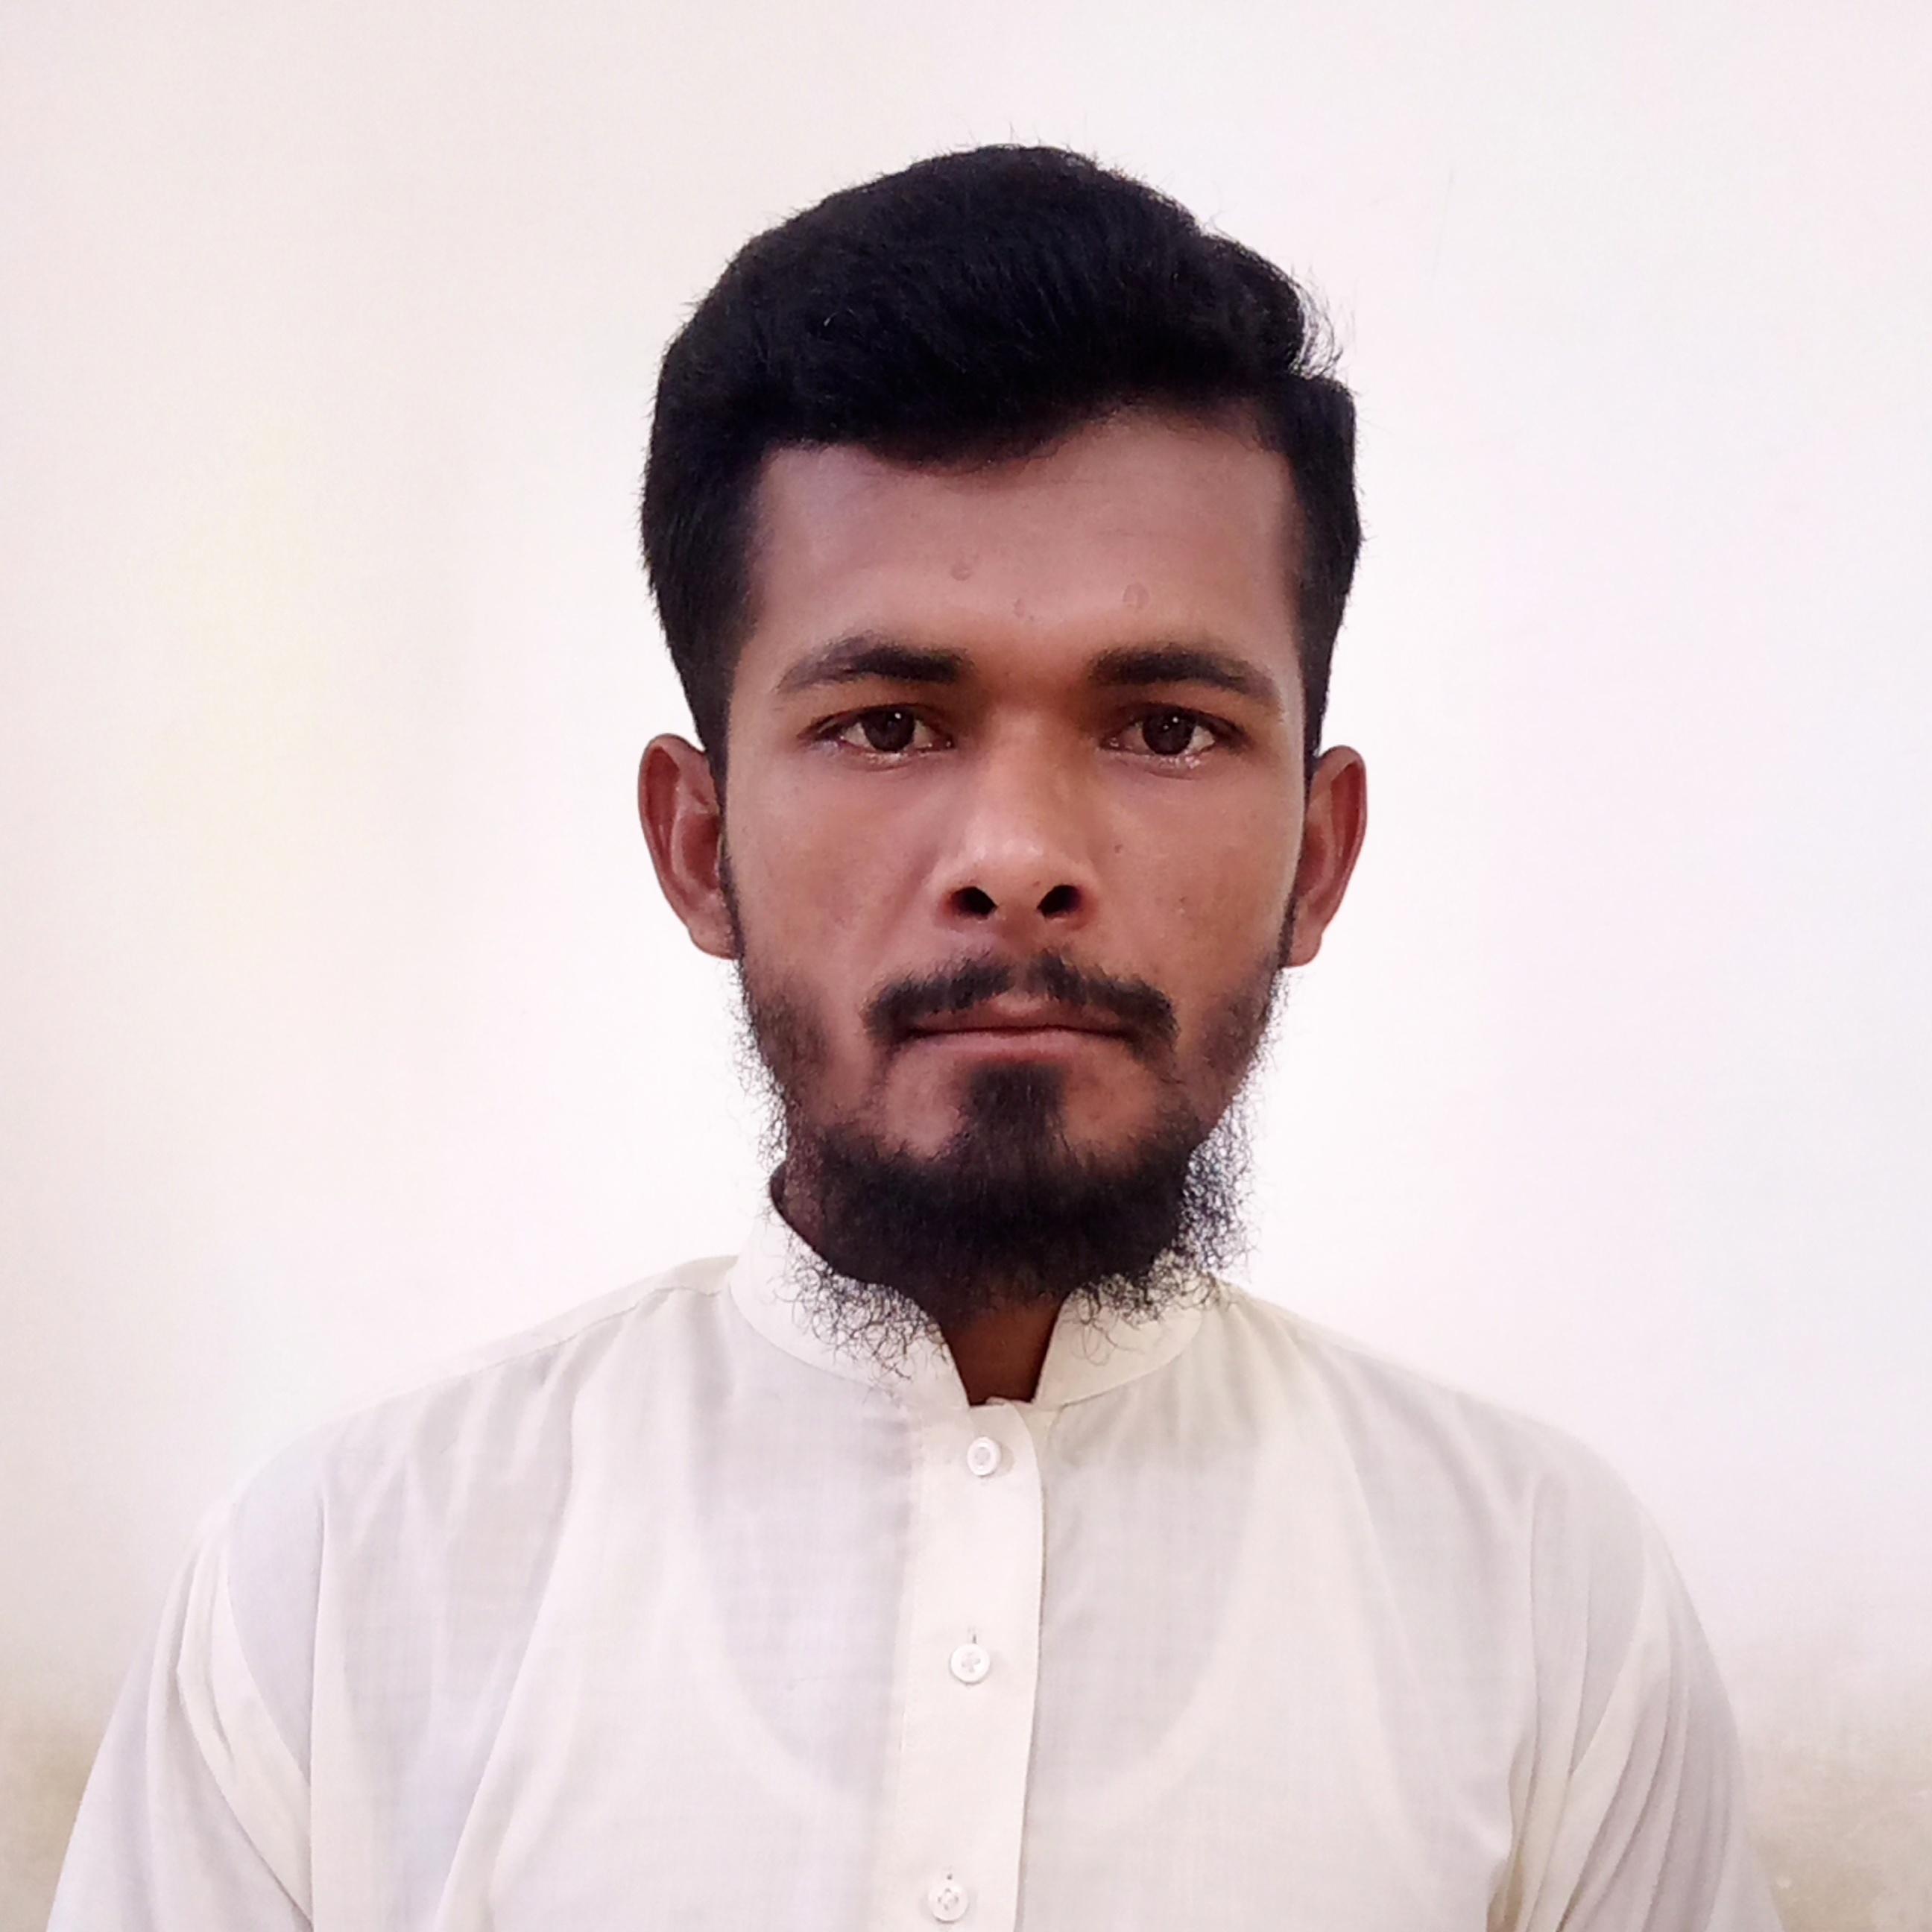 Khurram Faheem